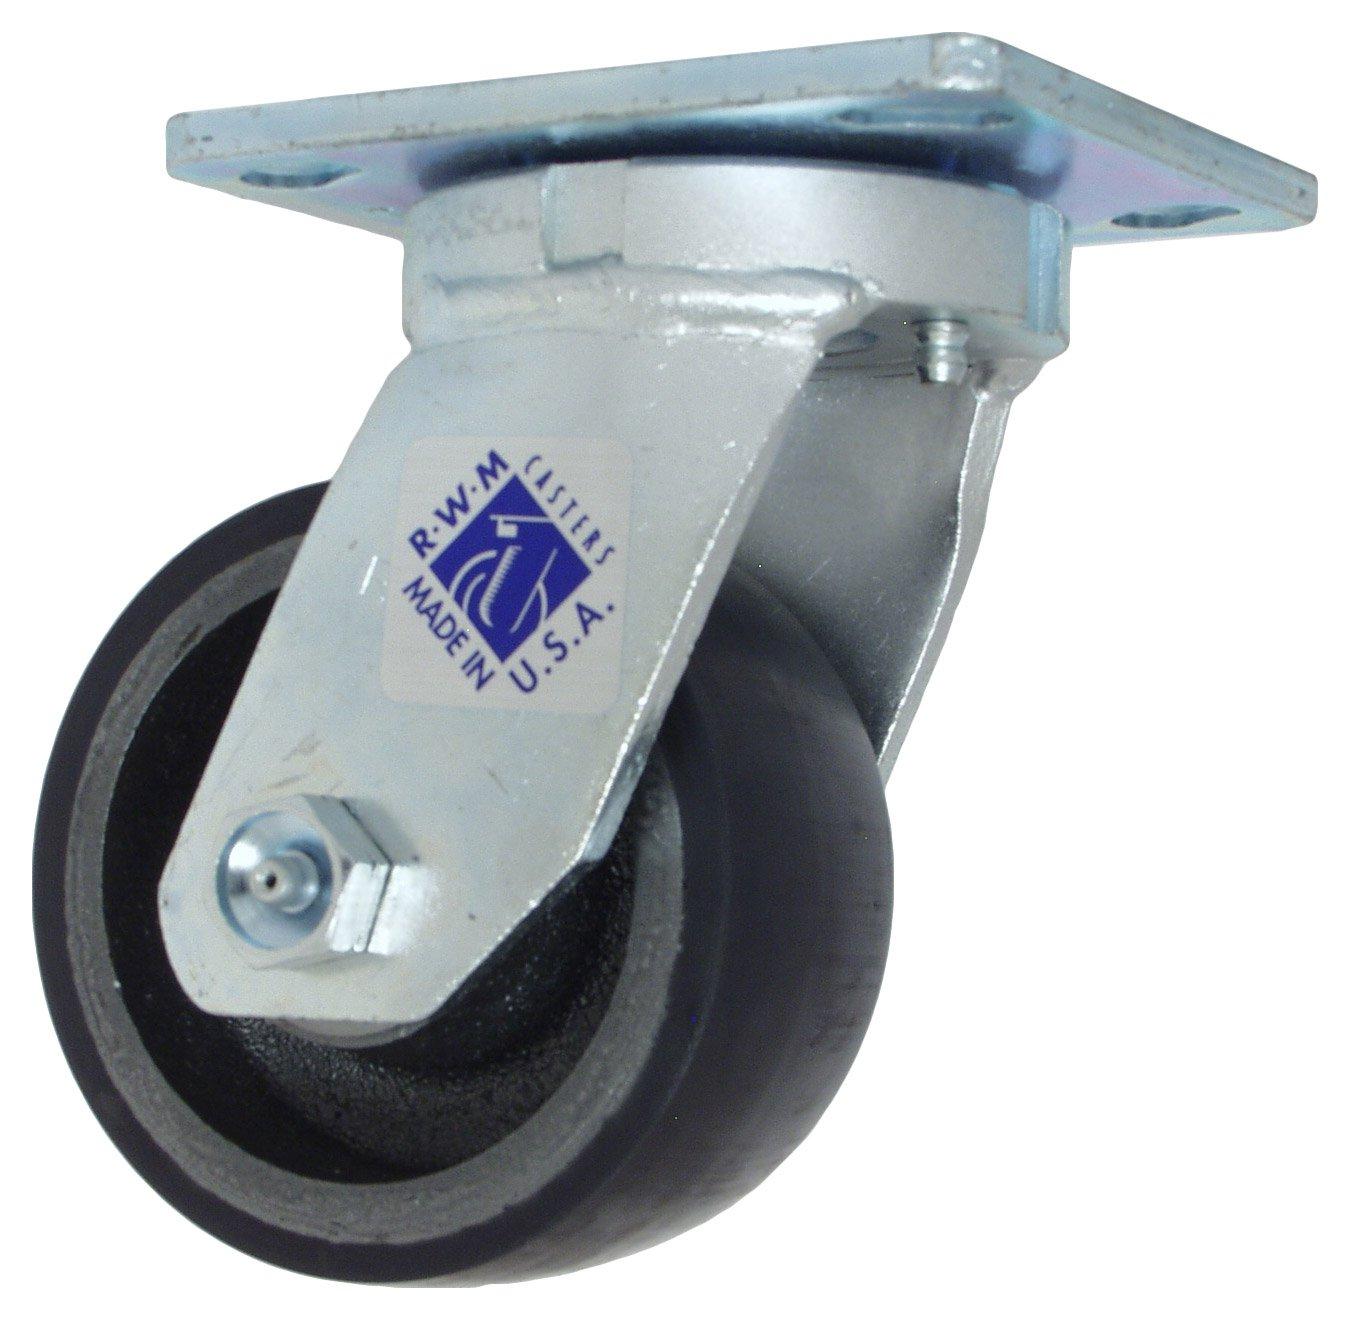 Roller Bearing Kingpinless 6-1//2 Mount Height 4-1//2 Plate Length Rigid 2 Wheel Width 5 Wheel Dia 1000 lbs Capacity RWM Casters 65 Series Plate Caster Cast Iron Wheel 4 Plate Width